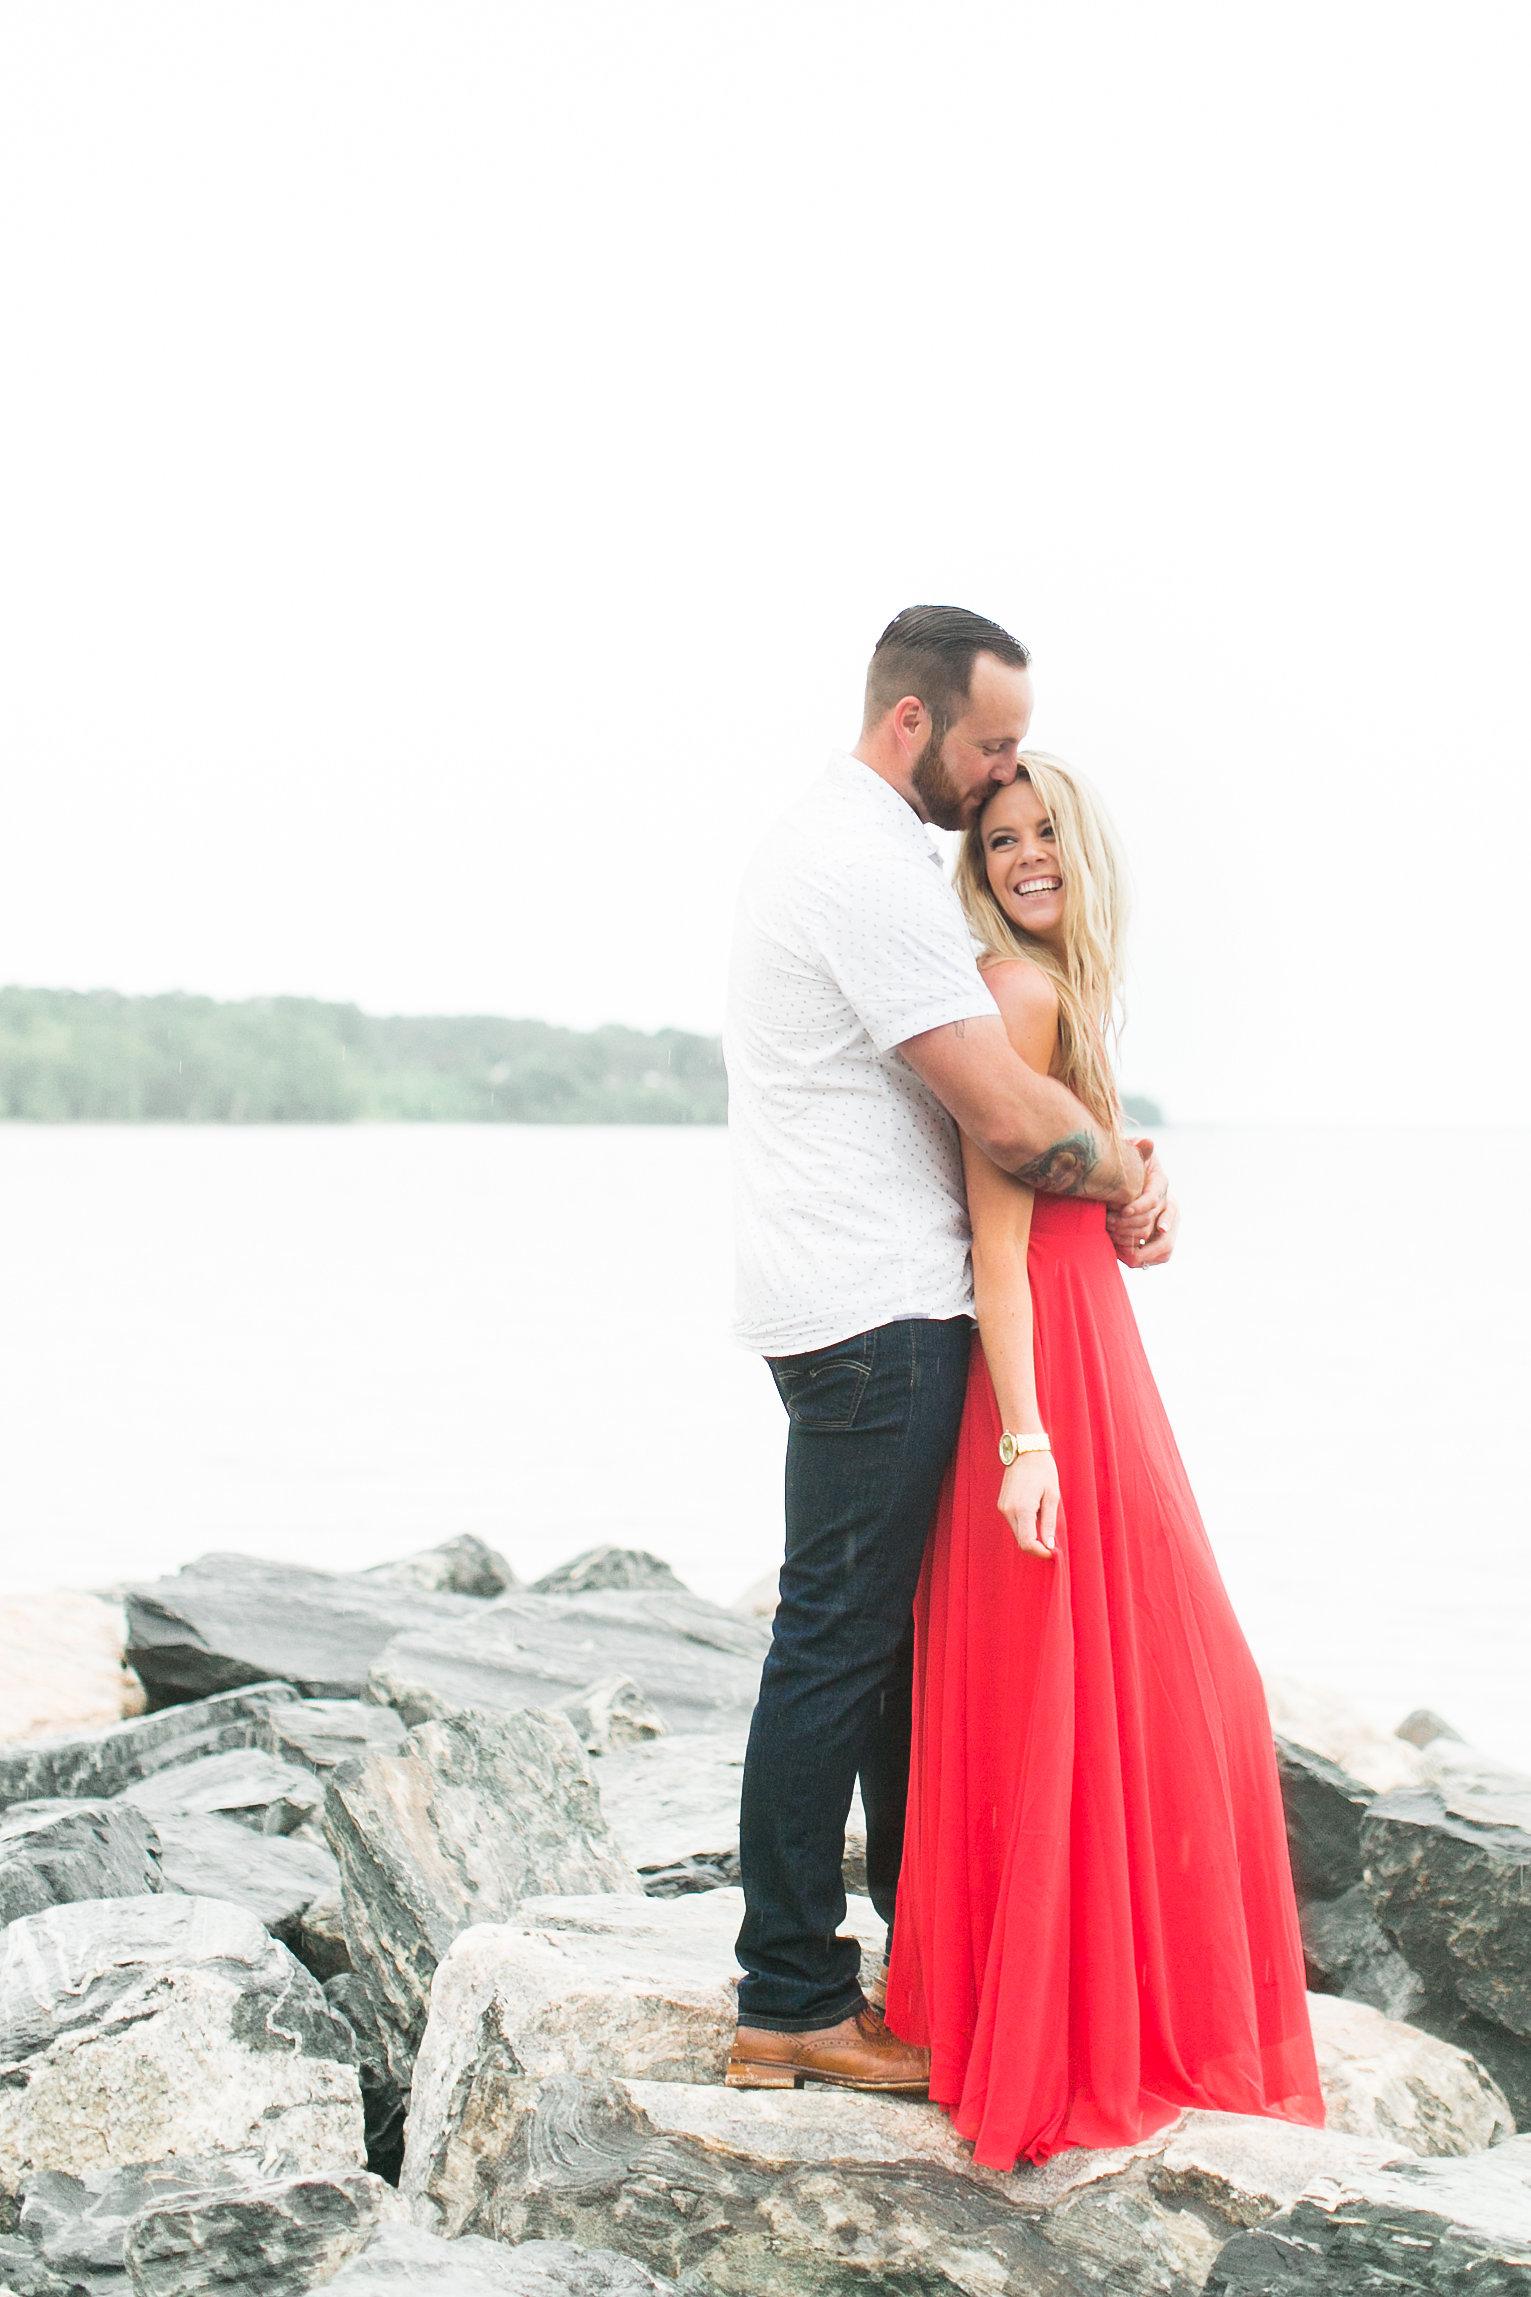 Taylor&Jesse-Engaged-192.jpg